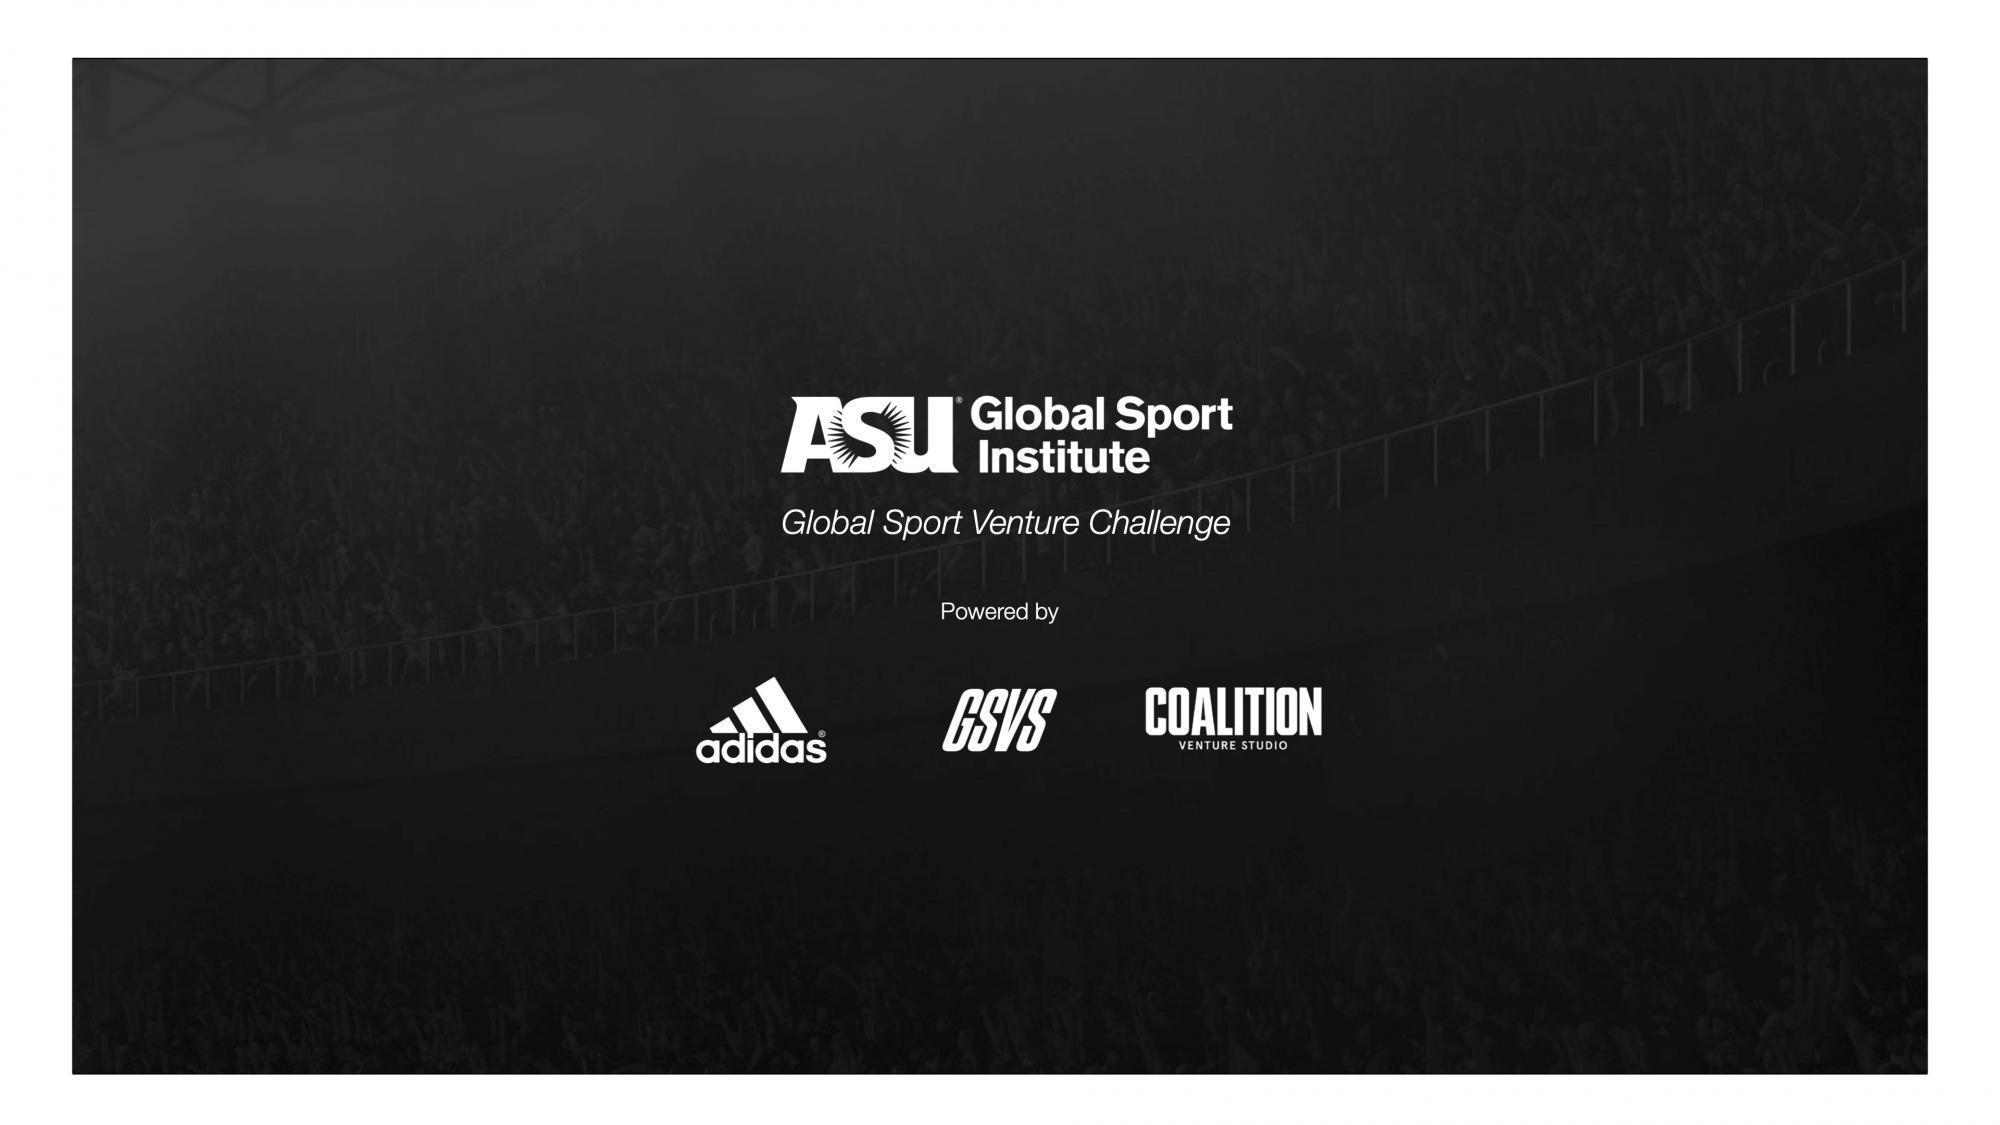 Logos for Global Sport Institute, adidas, GSVS, and Coalition Venture Studio